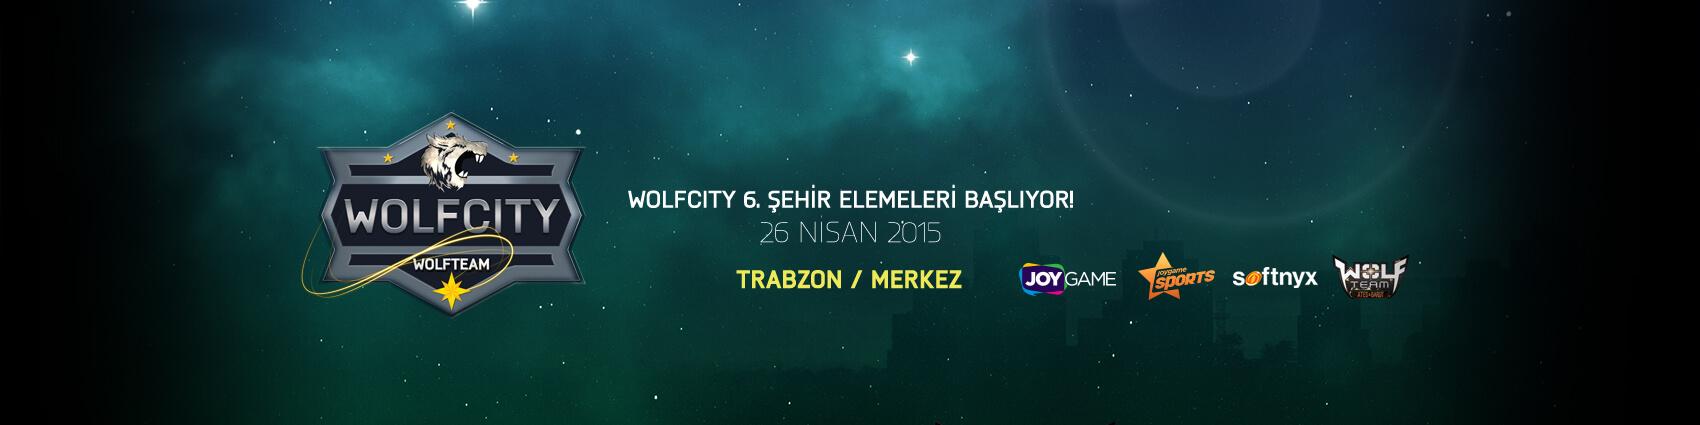 Wolfcity 6. Şehir Elemeleri - Trabzon